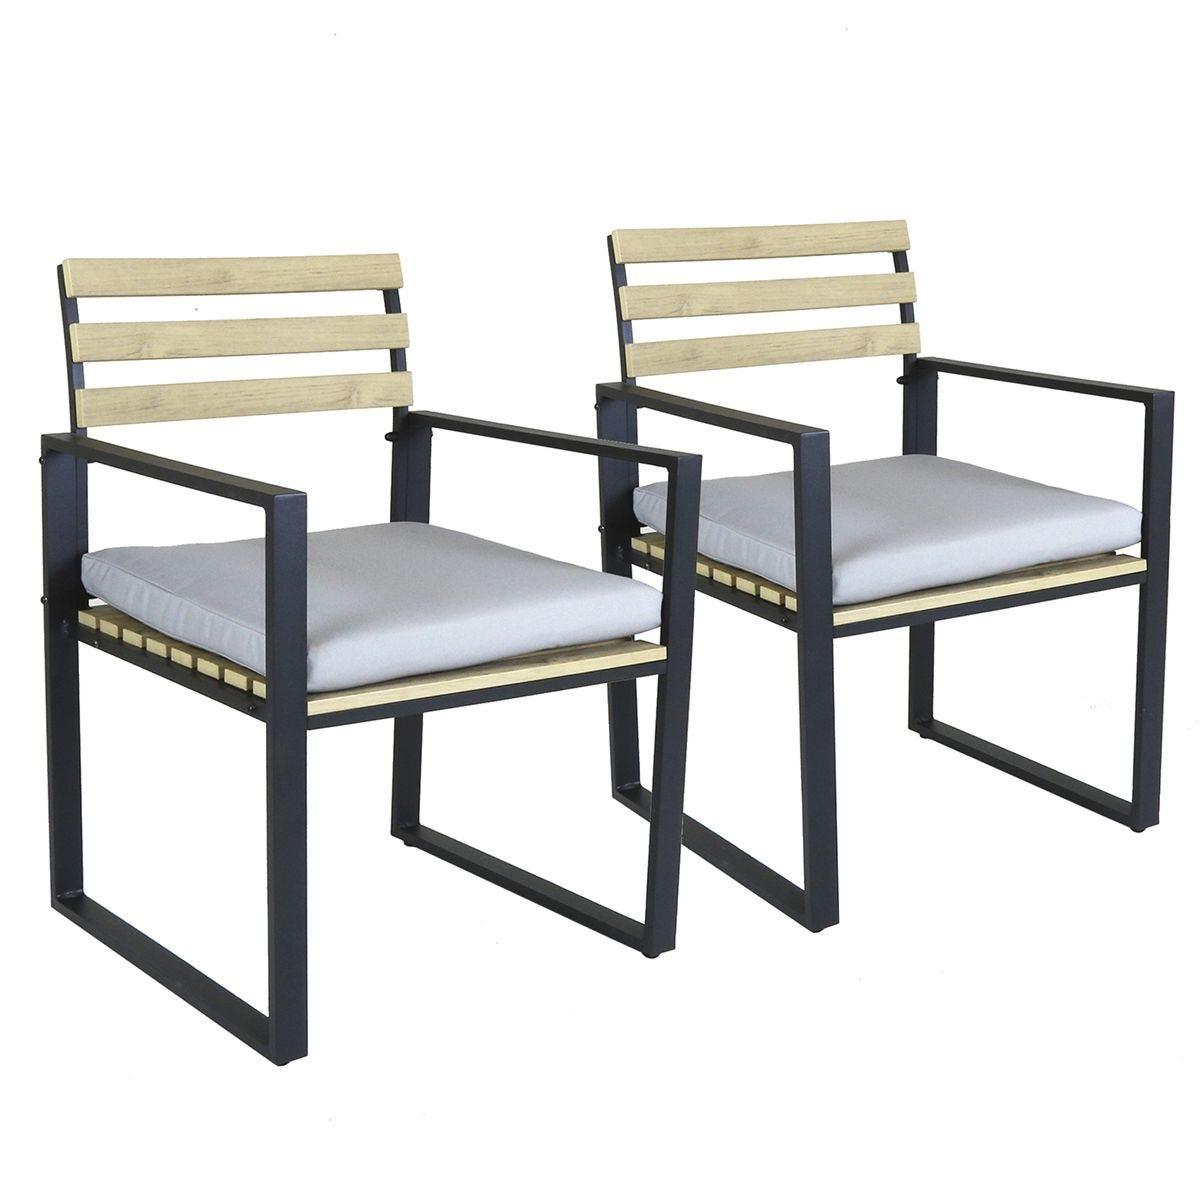 Charles Bentley Polywood and Aluminium Pair of Chairs